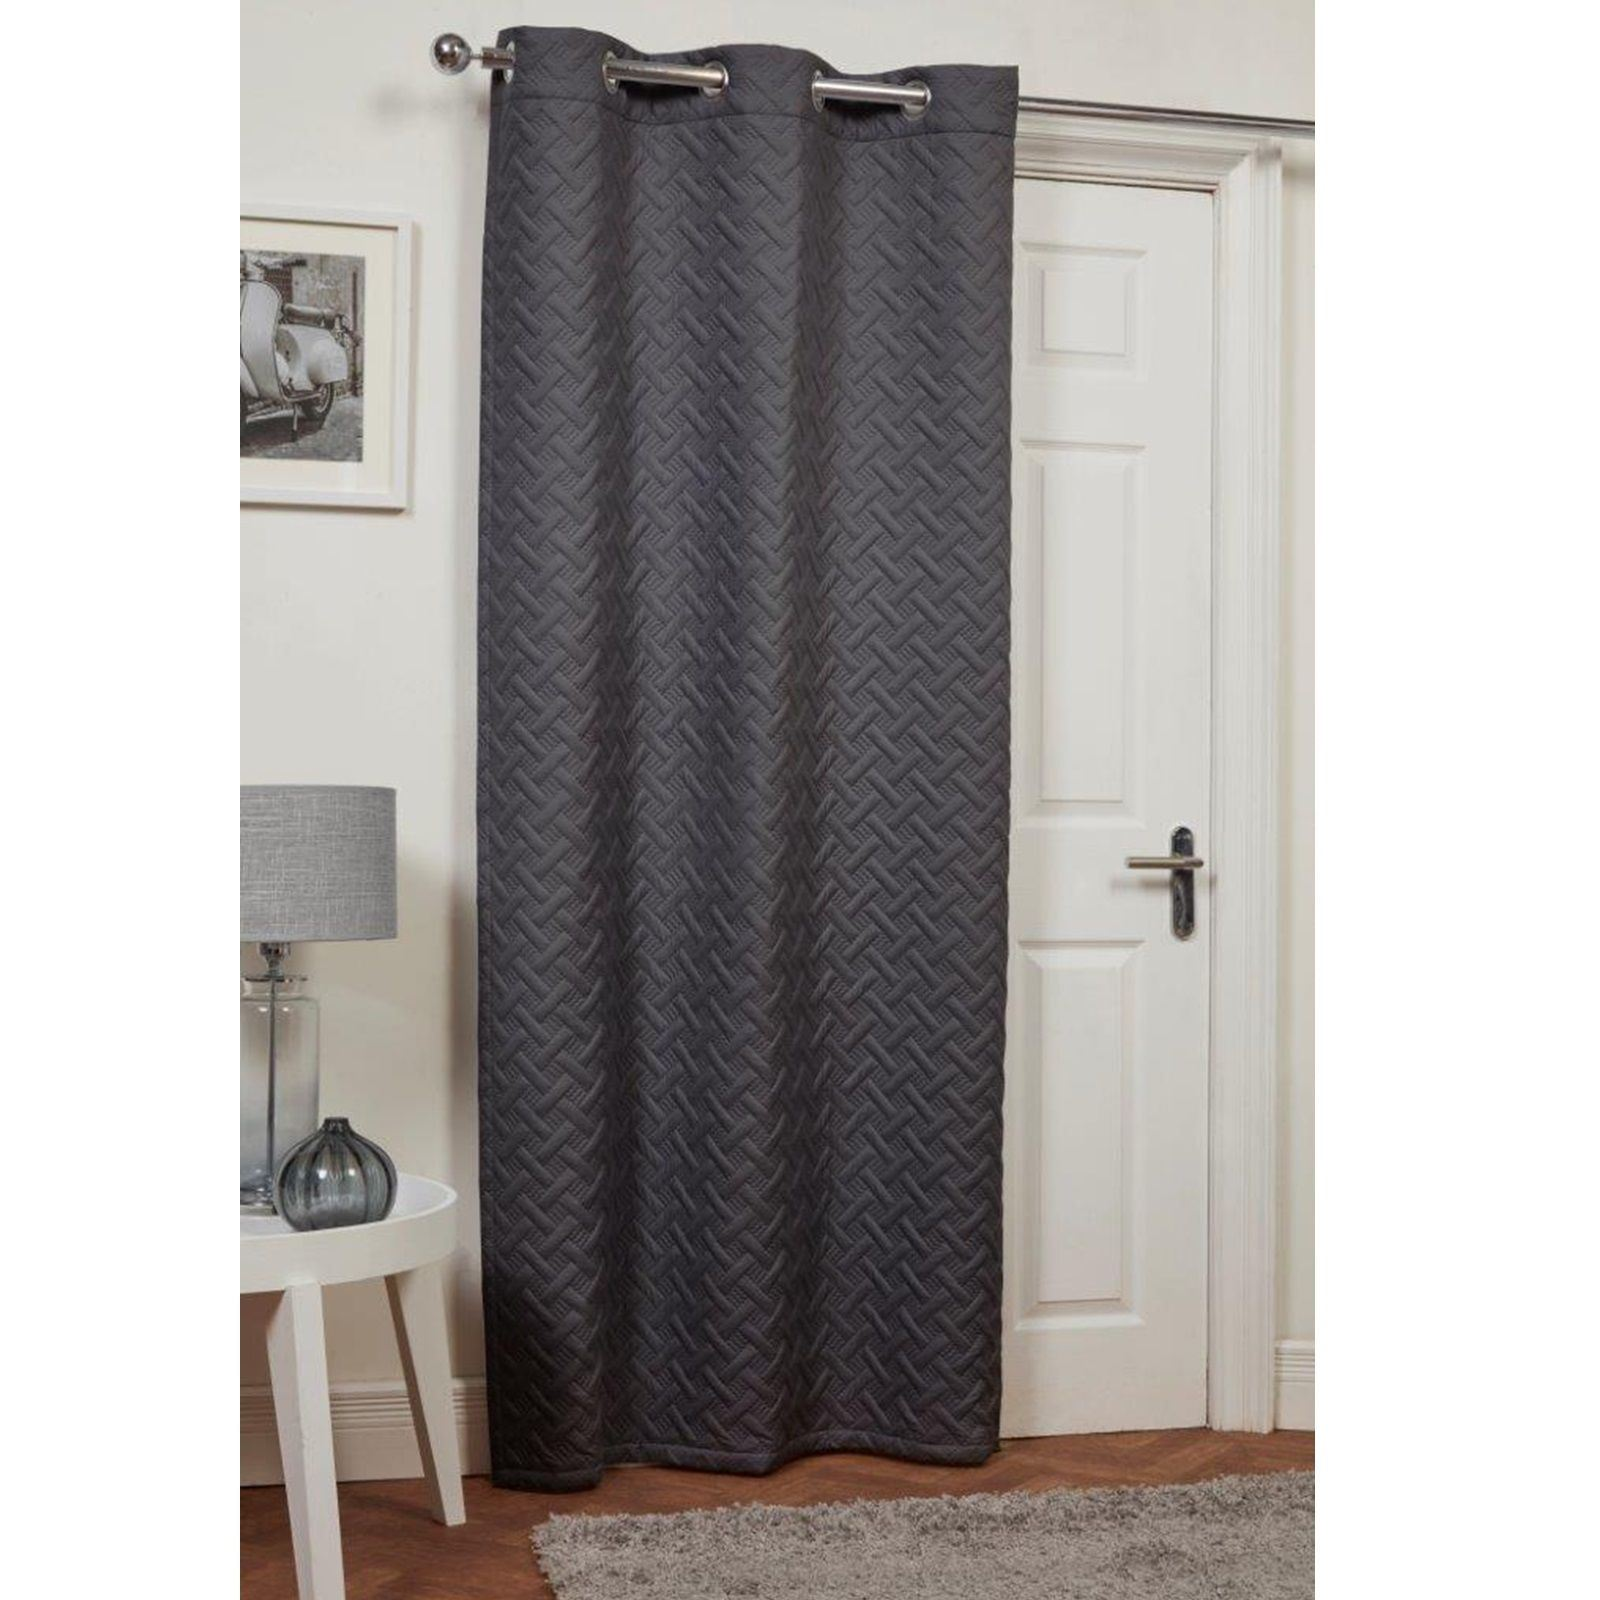 draft excluder curtains for doors. Black Bedroom Furniture Sets. Home Design Ideas